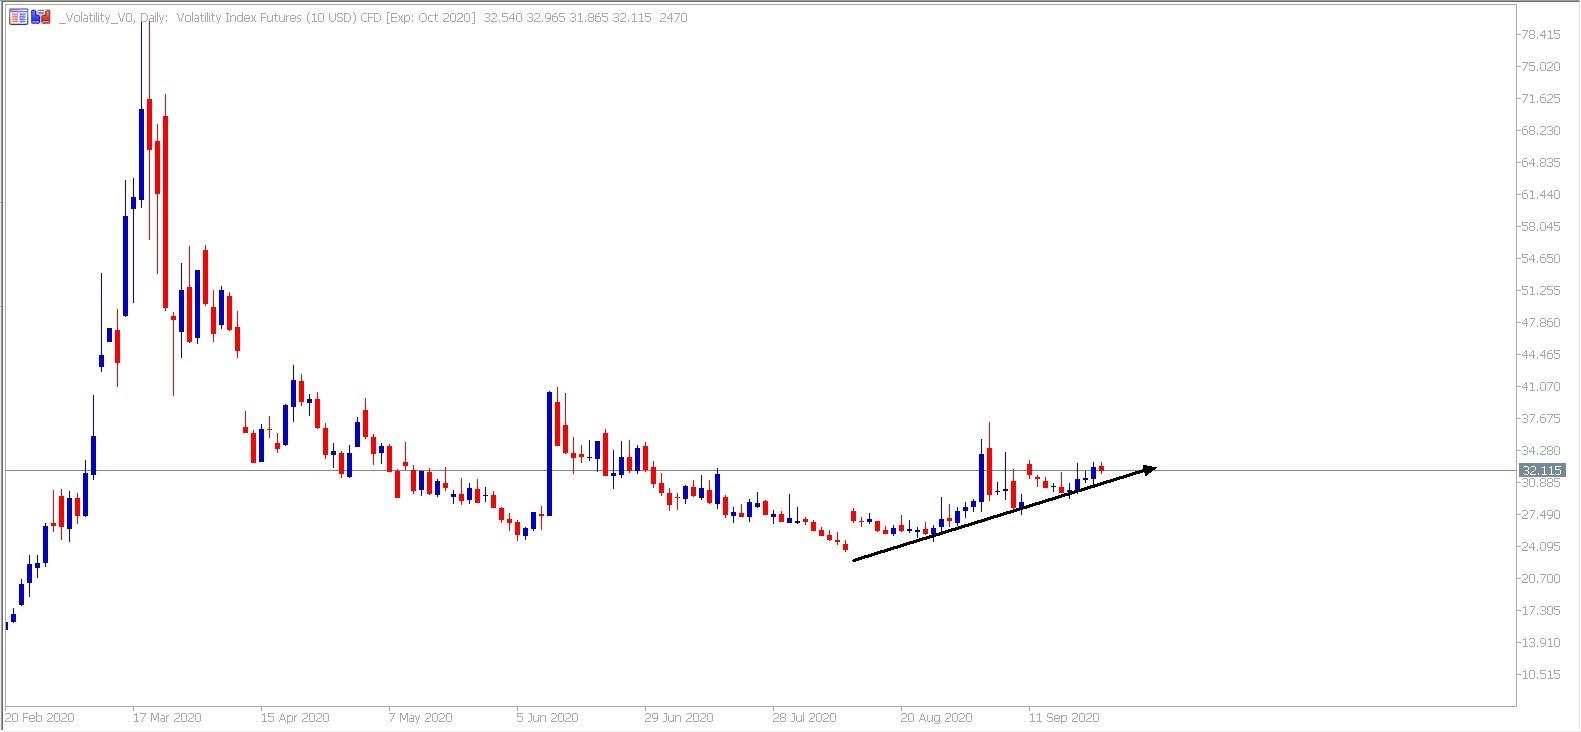 Admiral Markets MetaTrader 5. Denní graf VIX CFD